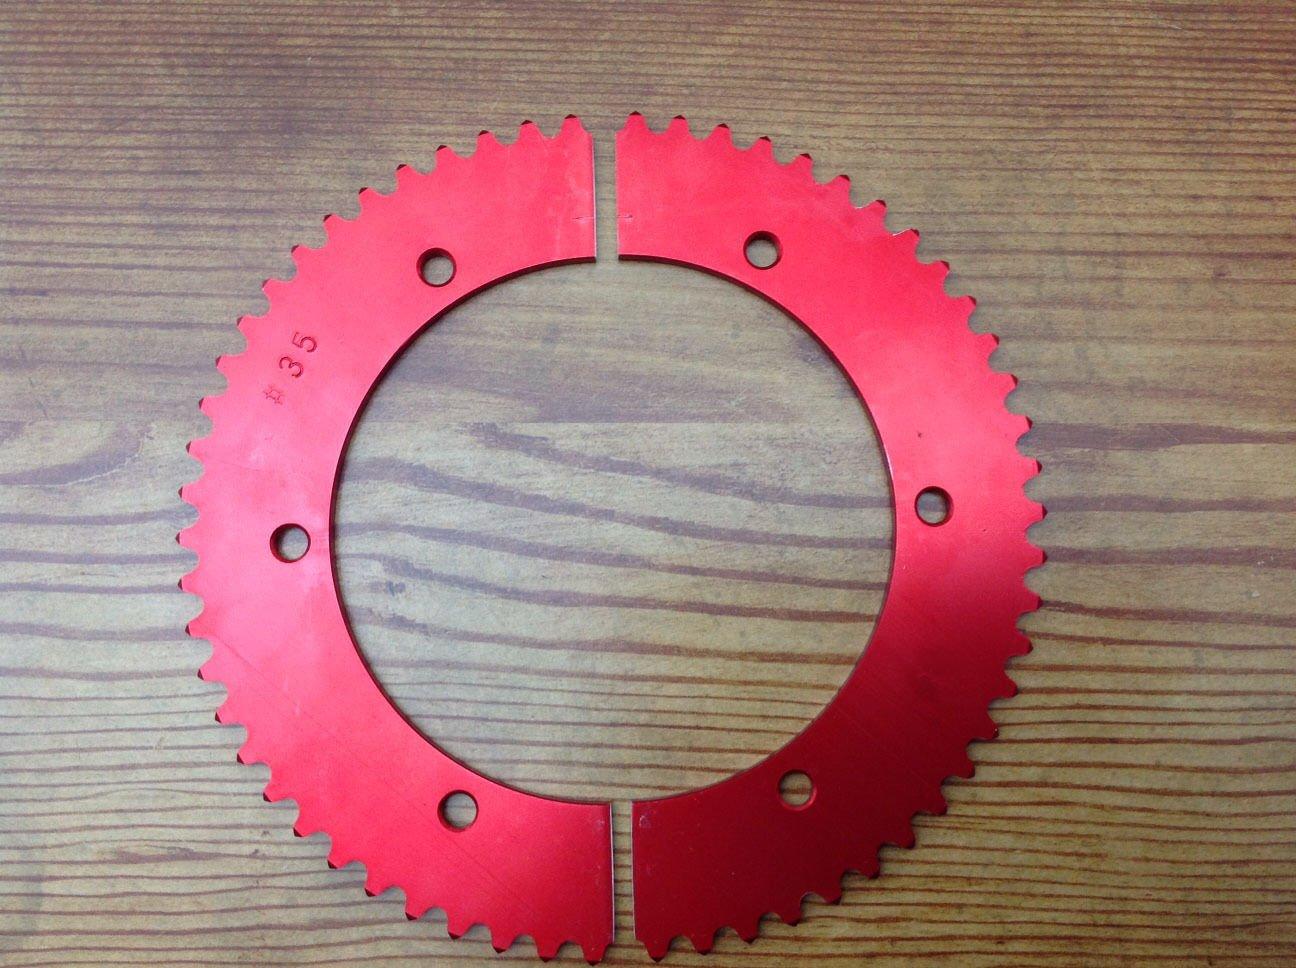 2-Piece #35 Pitch Split Go Kart Sprocket Red Anodized - Aluminum 77